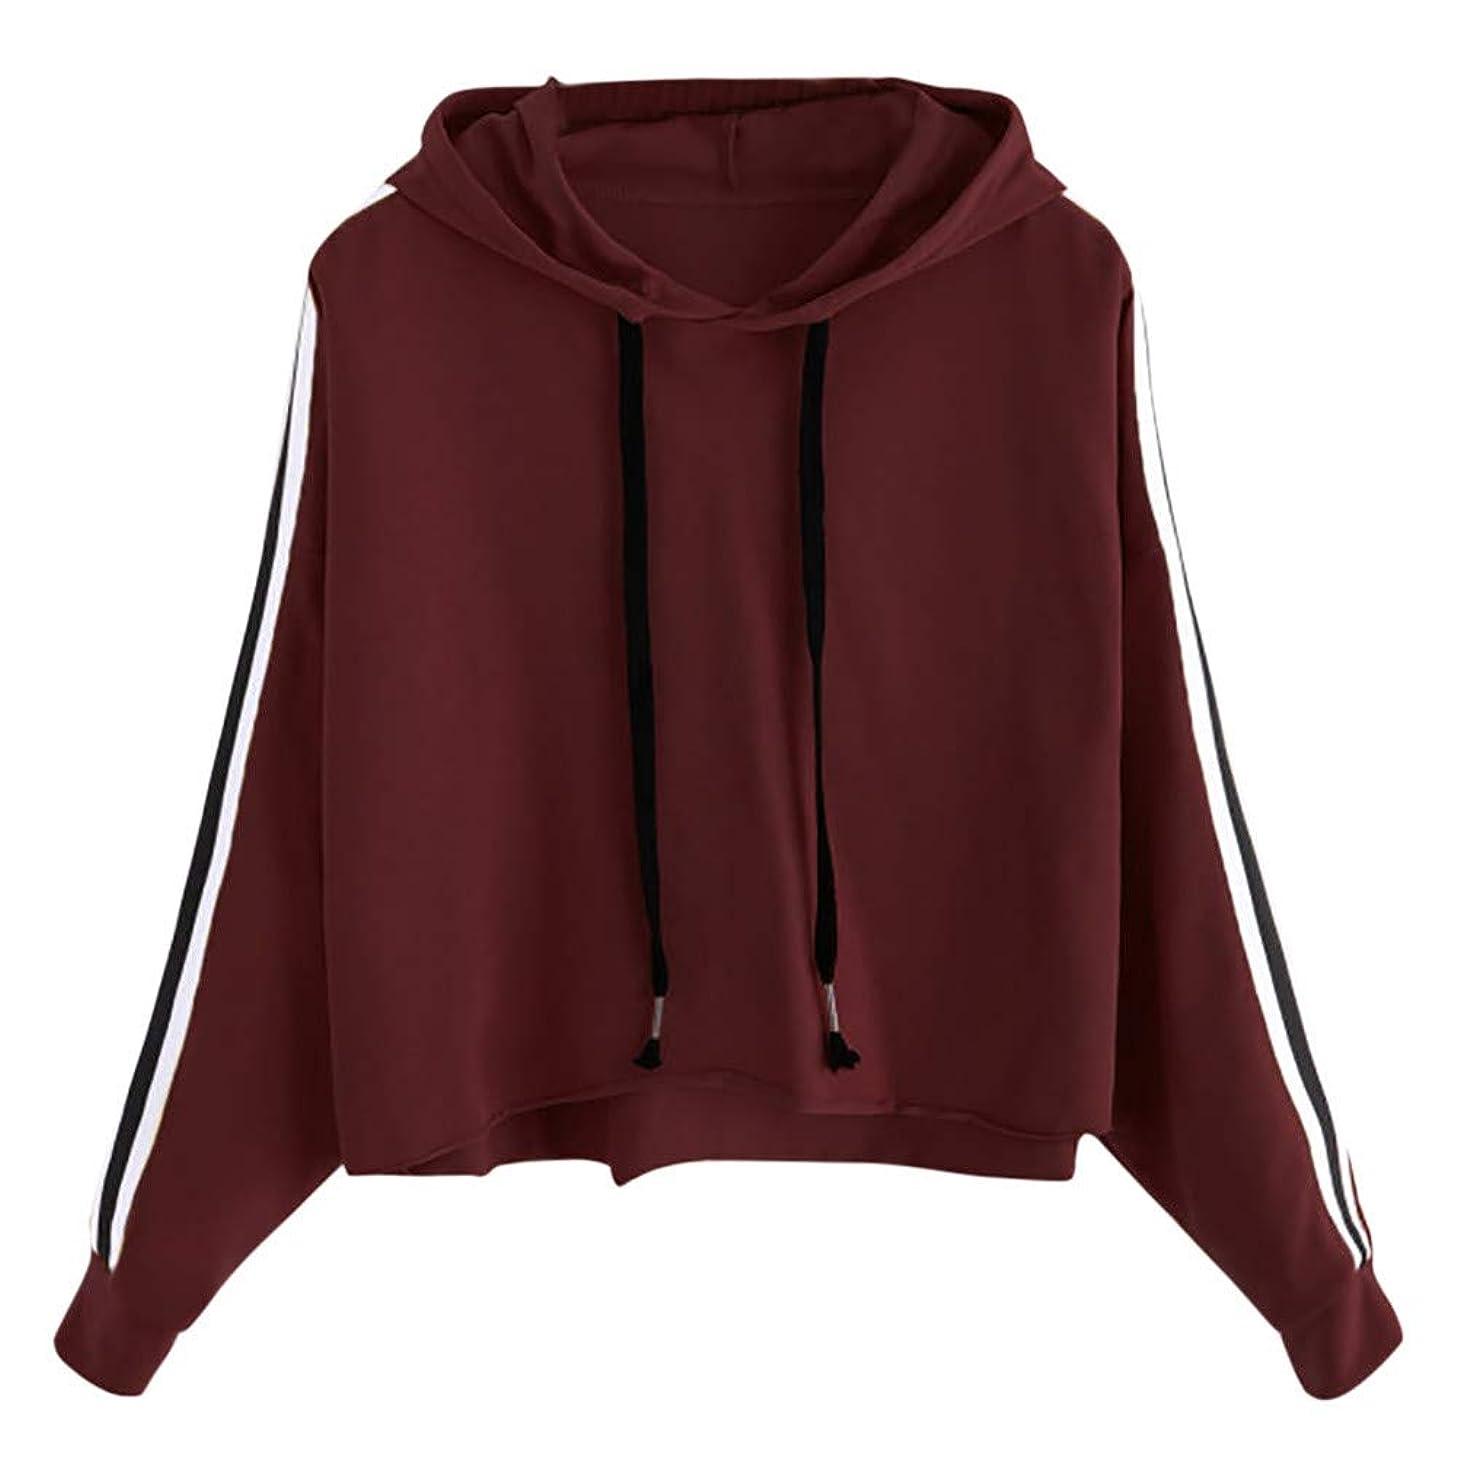 Amiley Women Fall Hoodies,Women Teen Girls Stripes Hoodie Sweatshirt Jumper Sweater Crop Pullover Tops